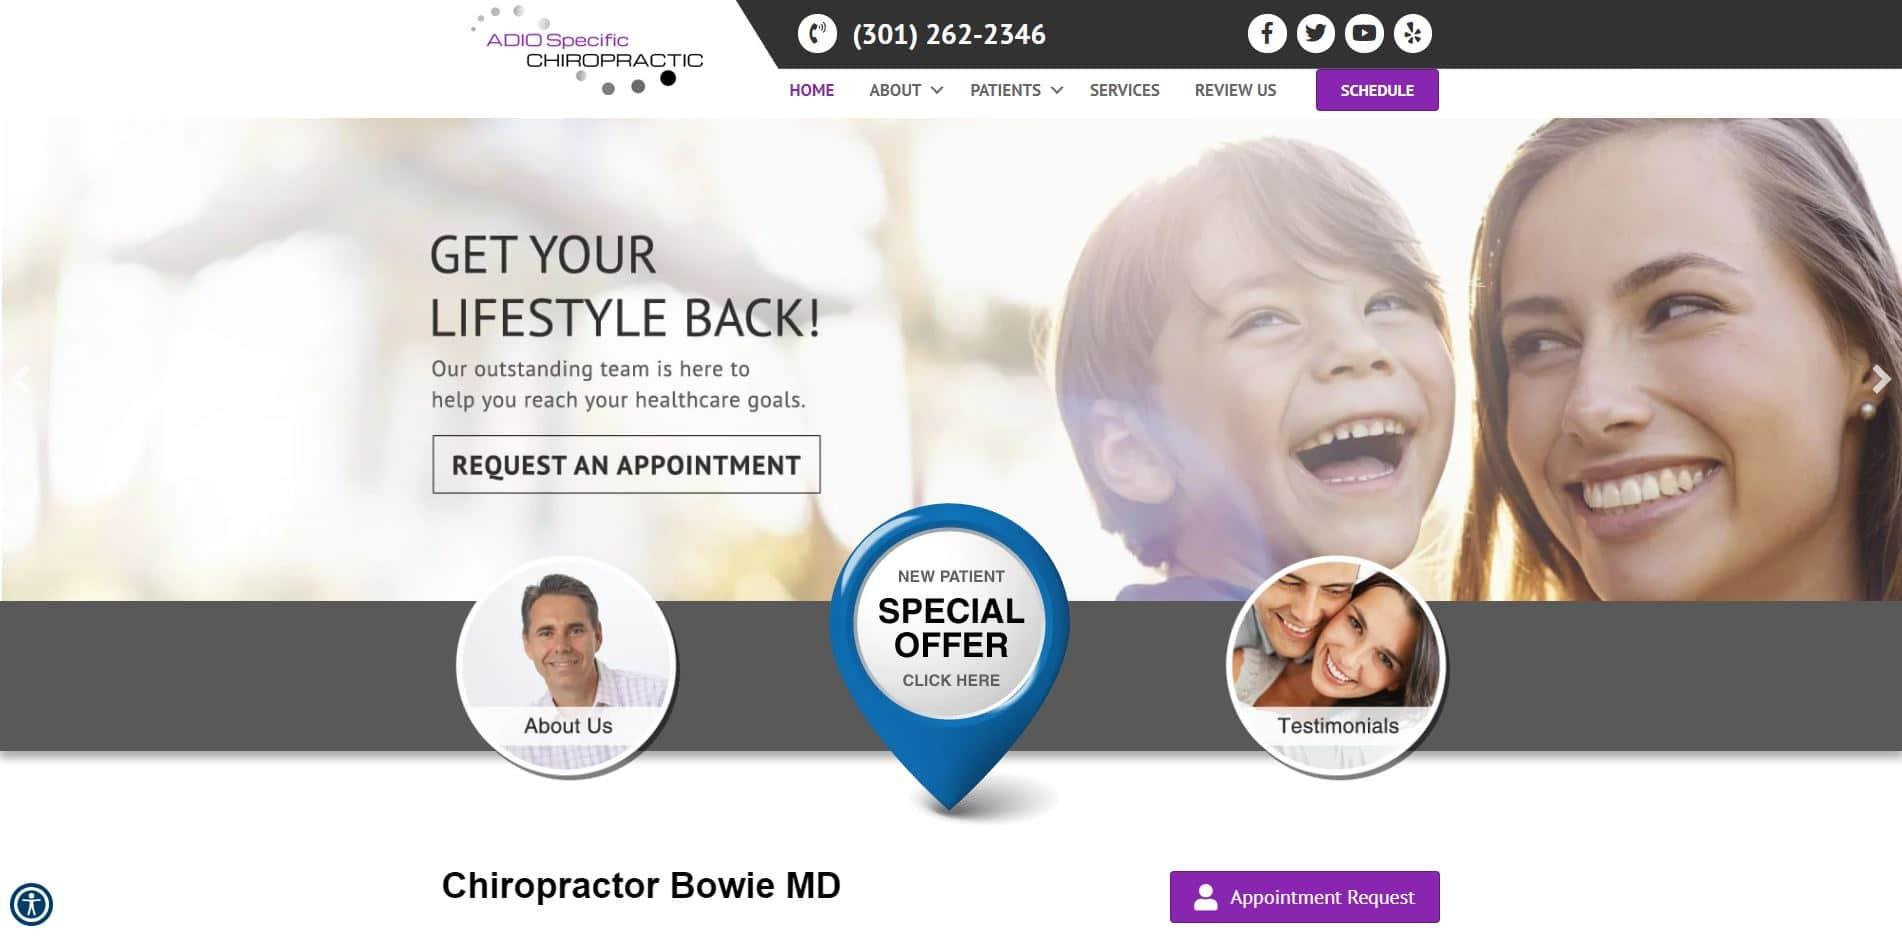 Chiropractor in Bowie